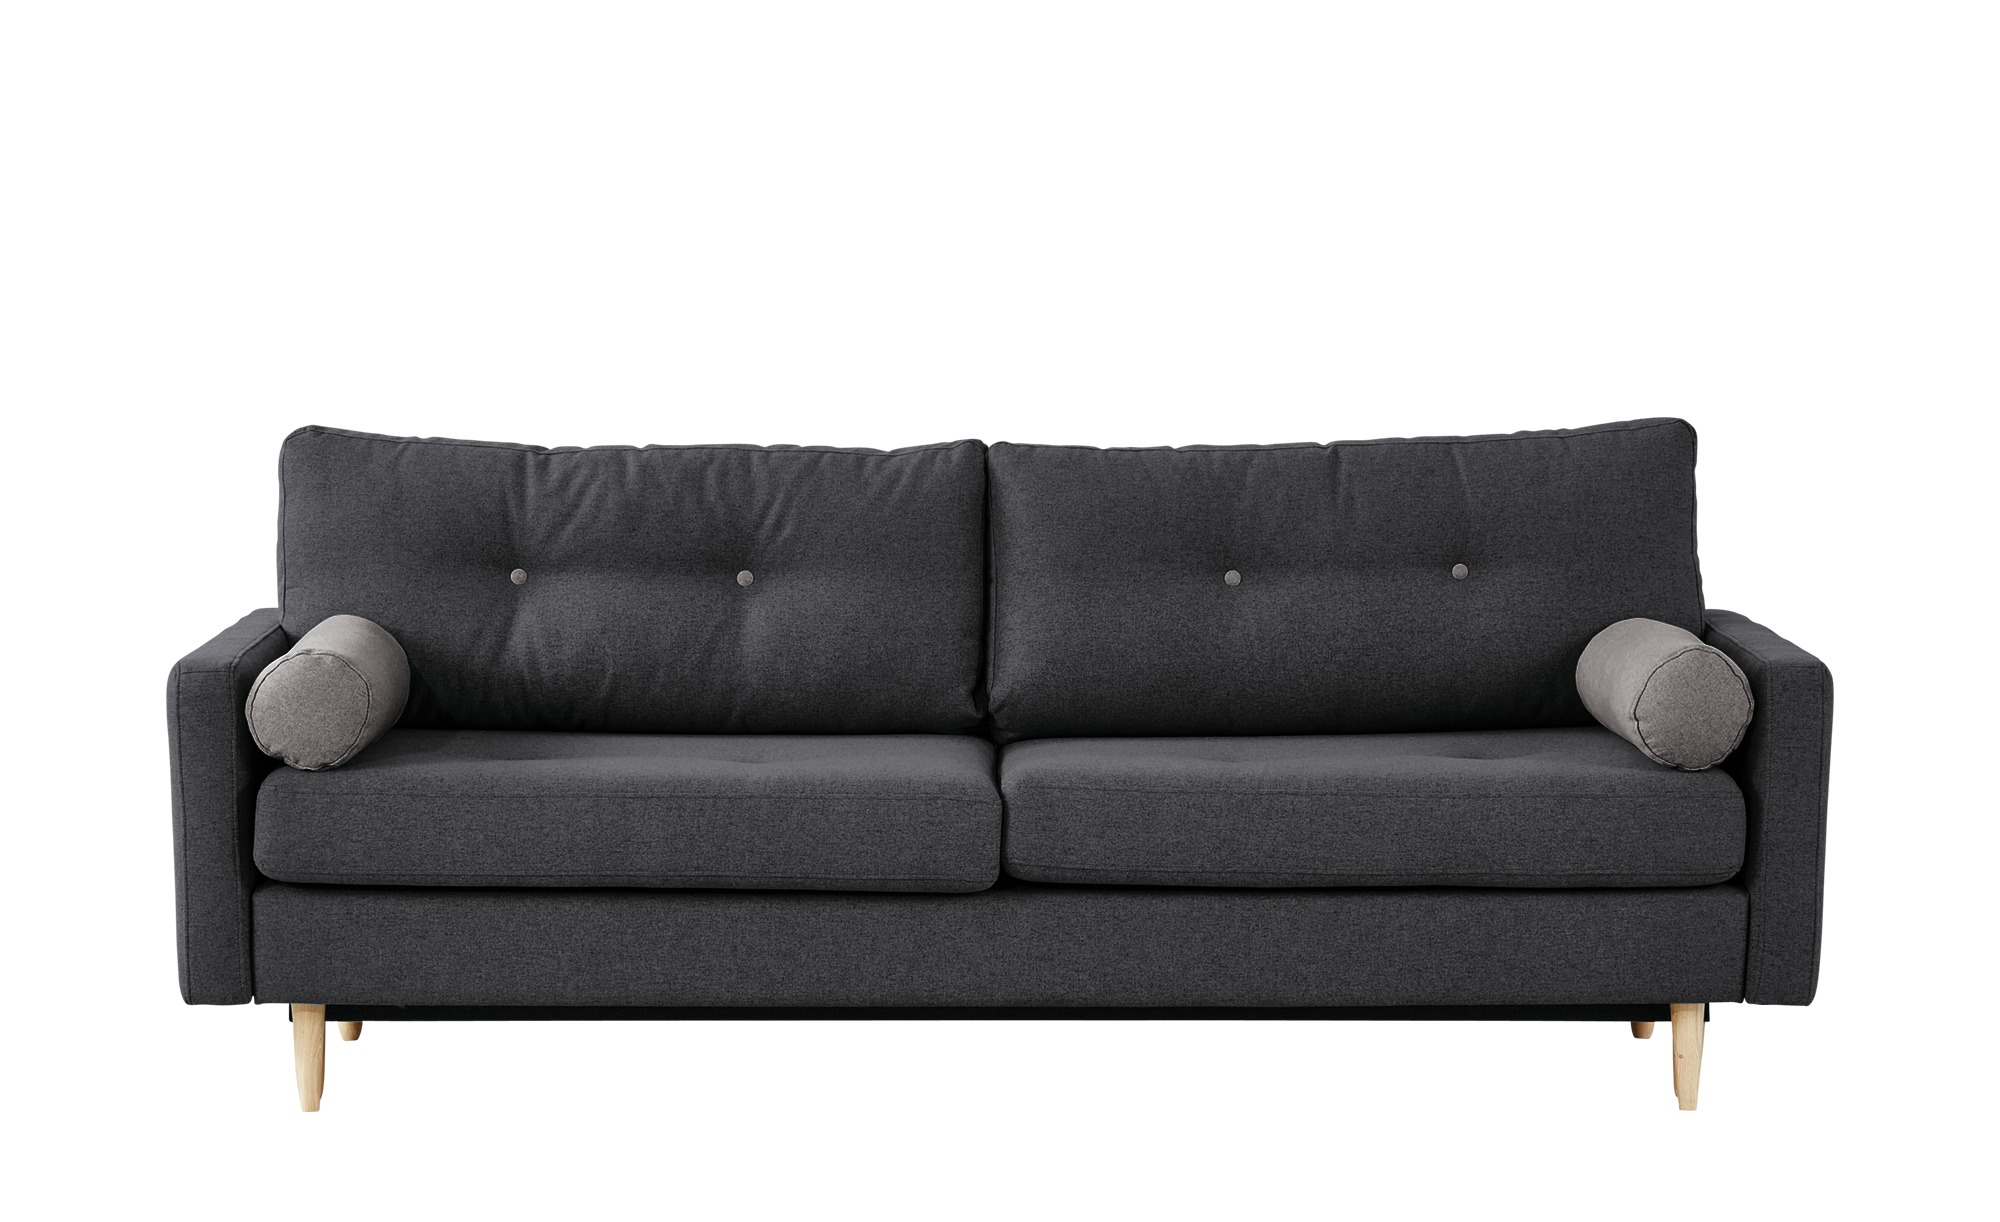 finya Design-Schlafsofa 3-sitzig dunkelgrau - Webstoff Pure ¦ Maße (cm): B: 218 H: 85 T: 93 Polstermöbel > Sofas > 3-Sitzer - Höffner